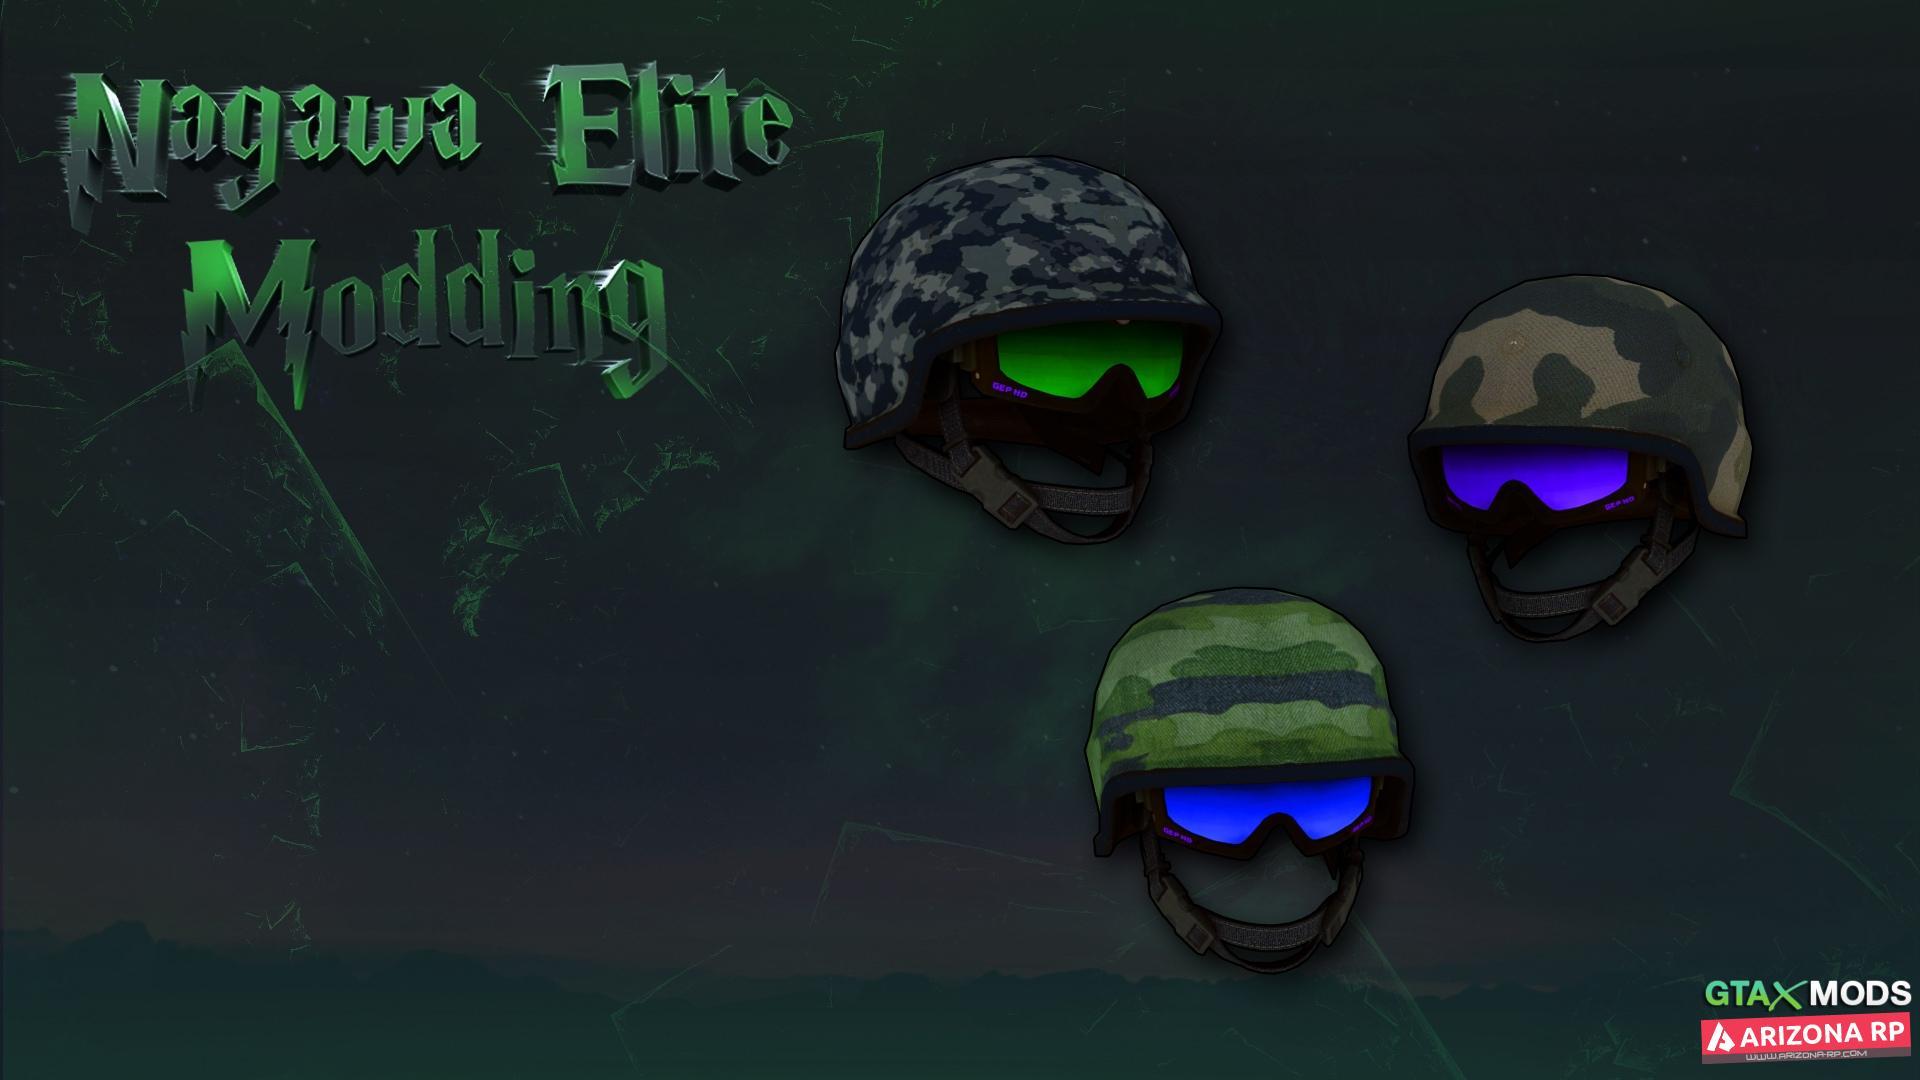 Mask | Королевская битва | Nagawa Elite Modding